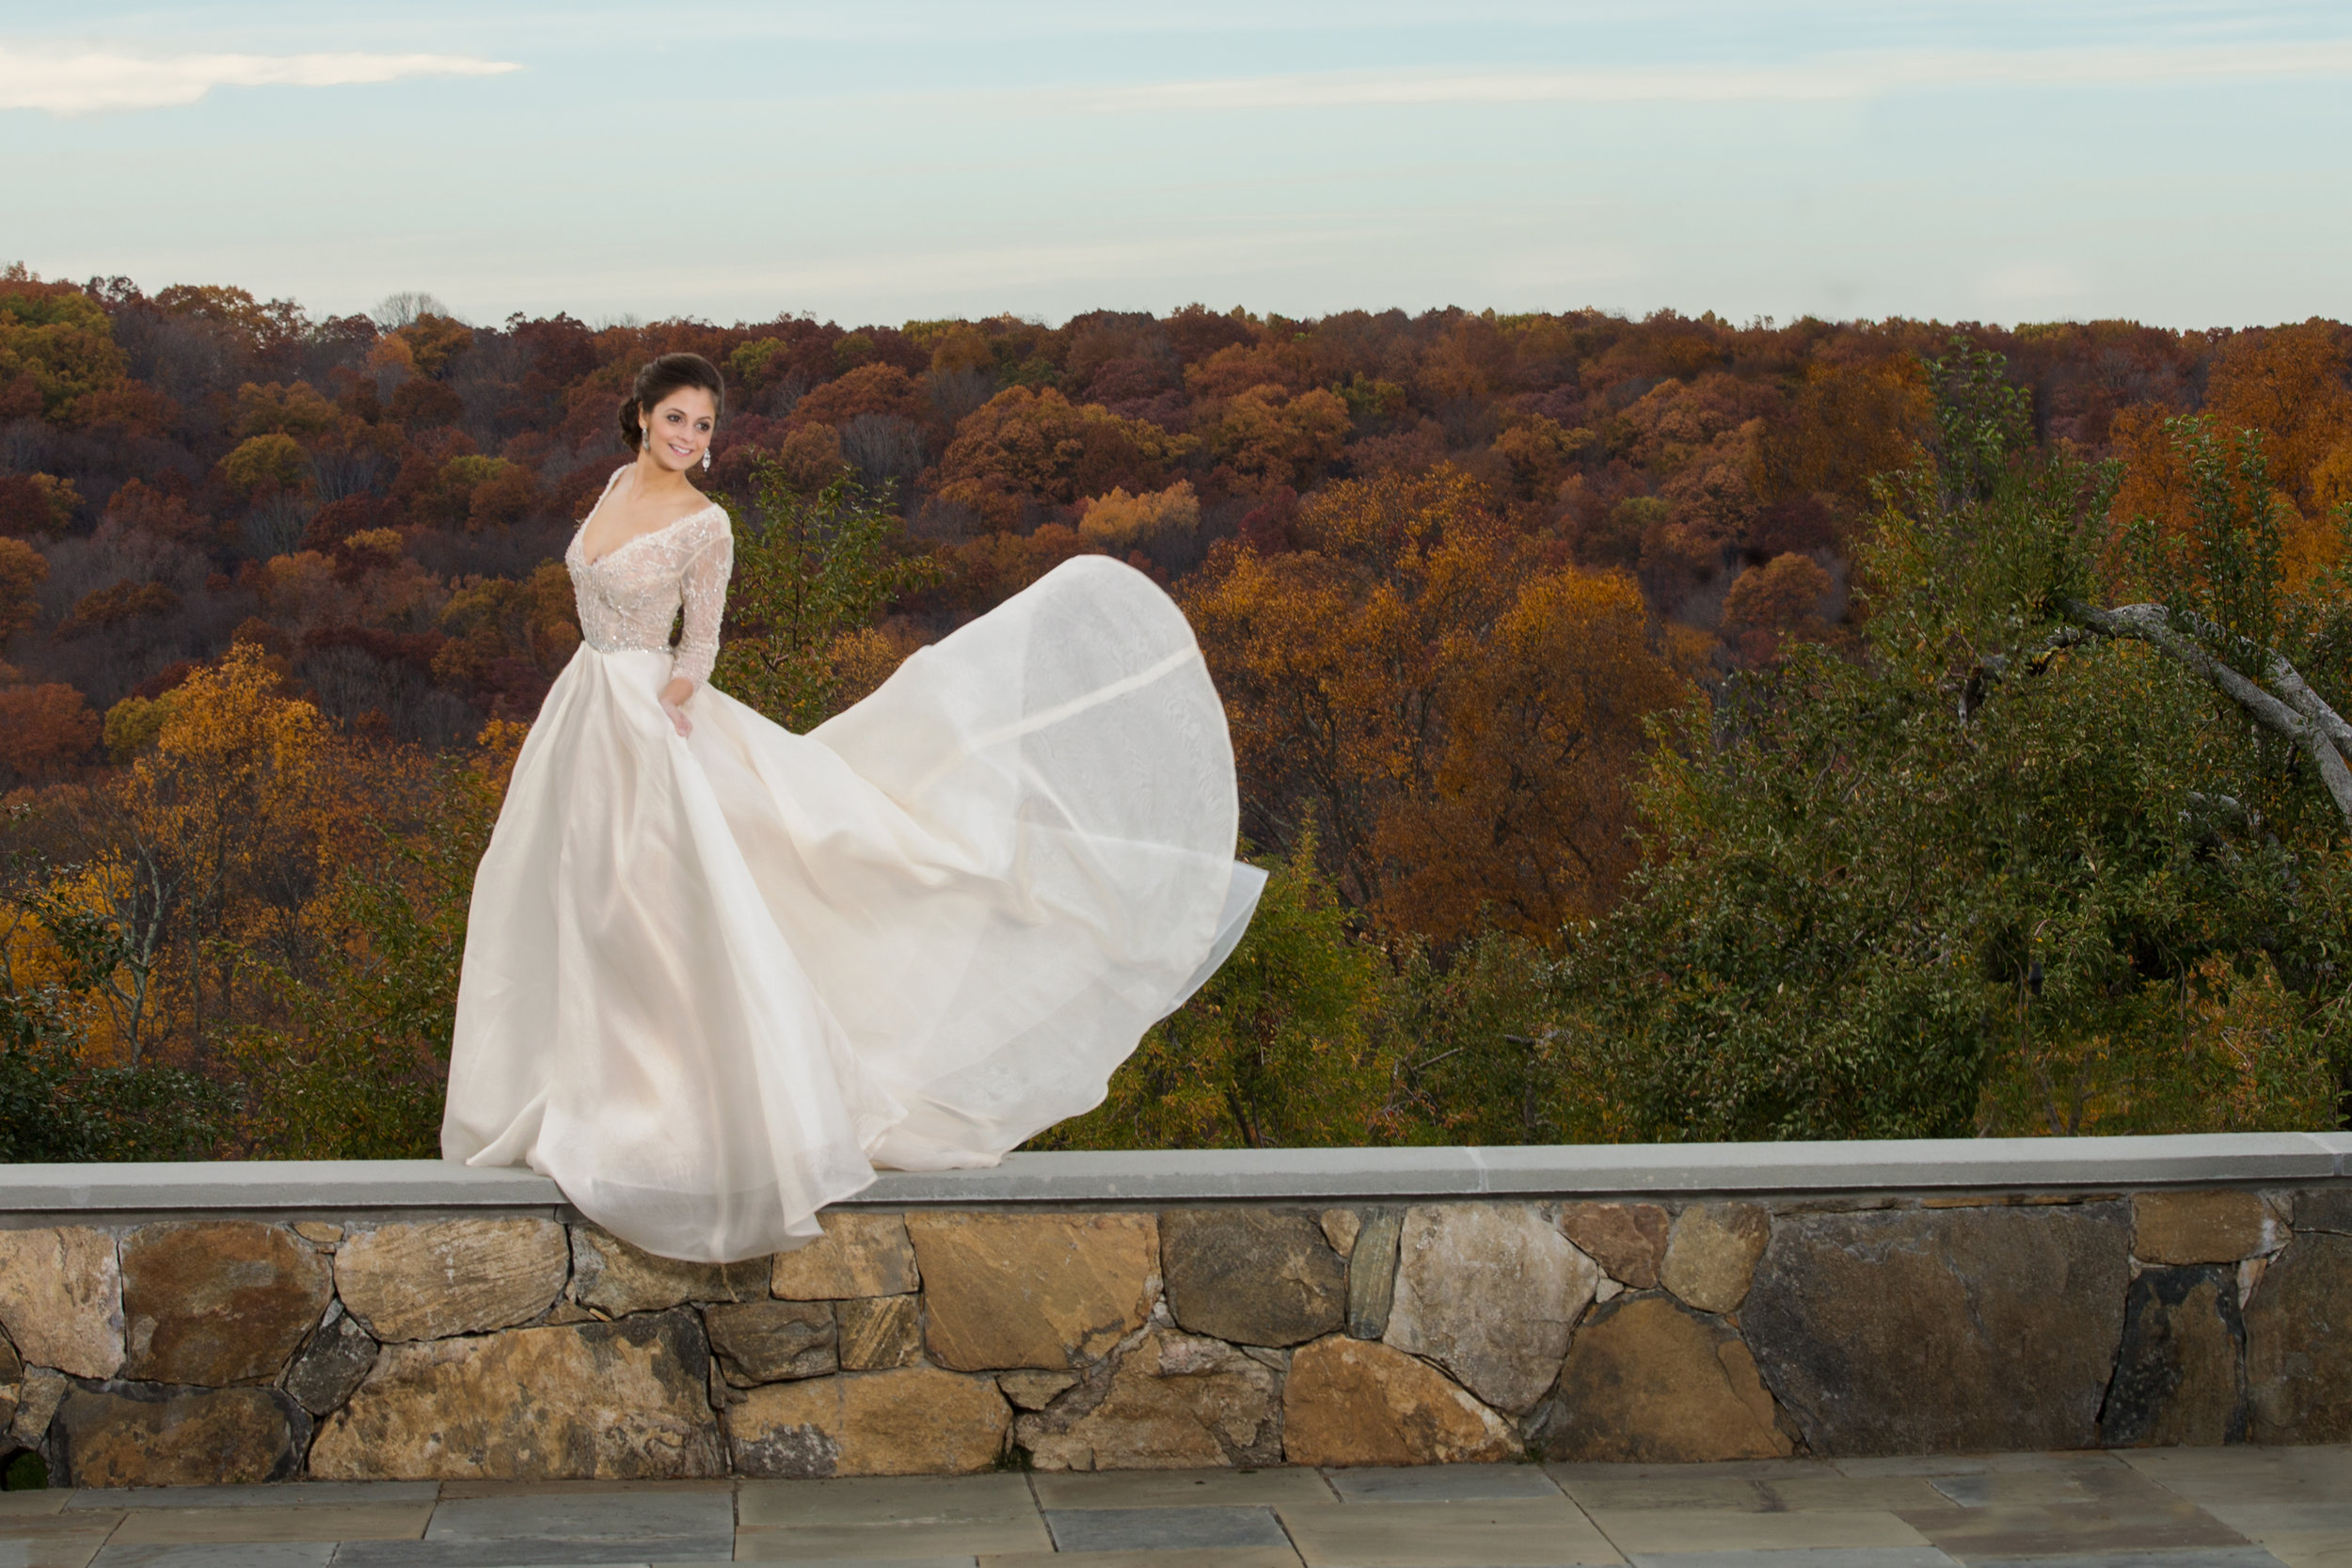 NY Wedding Planner at Harvest Moon Farm Orchard